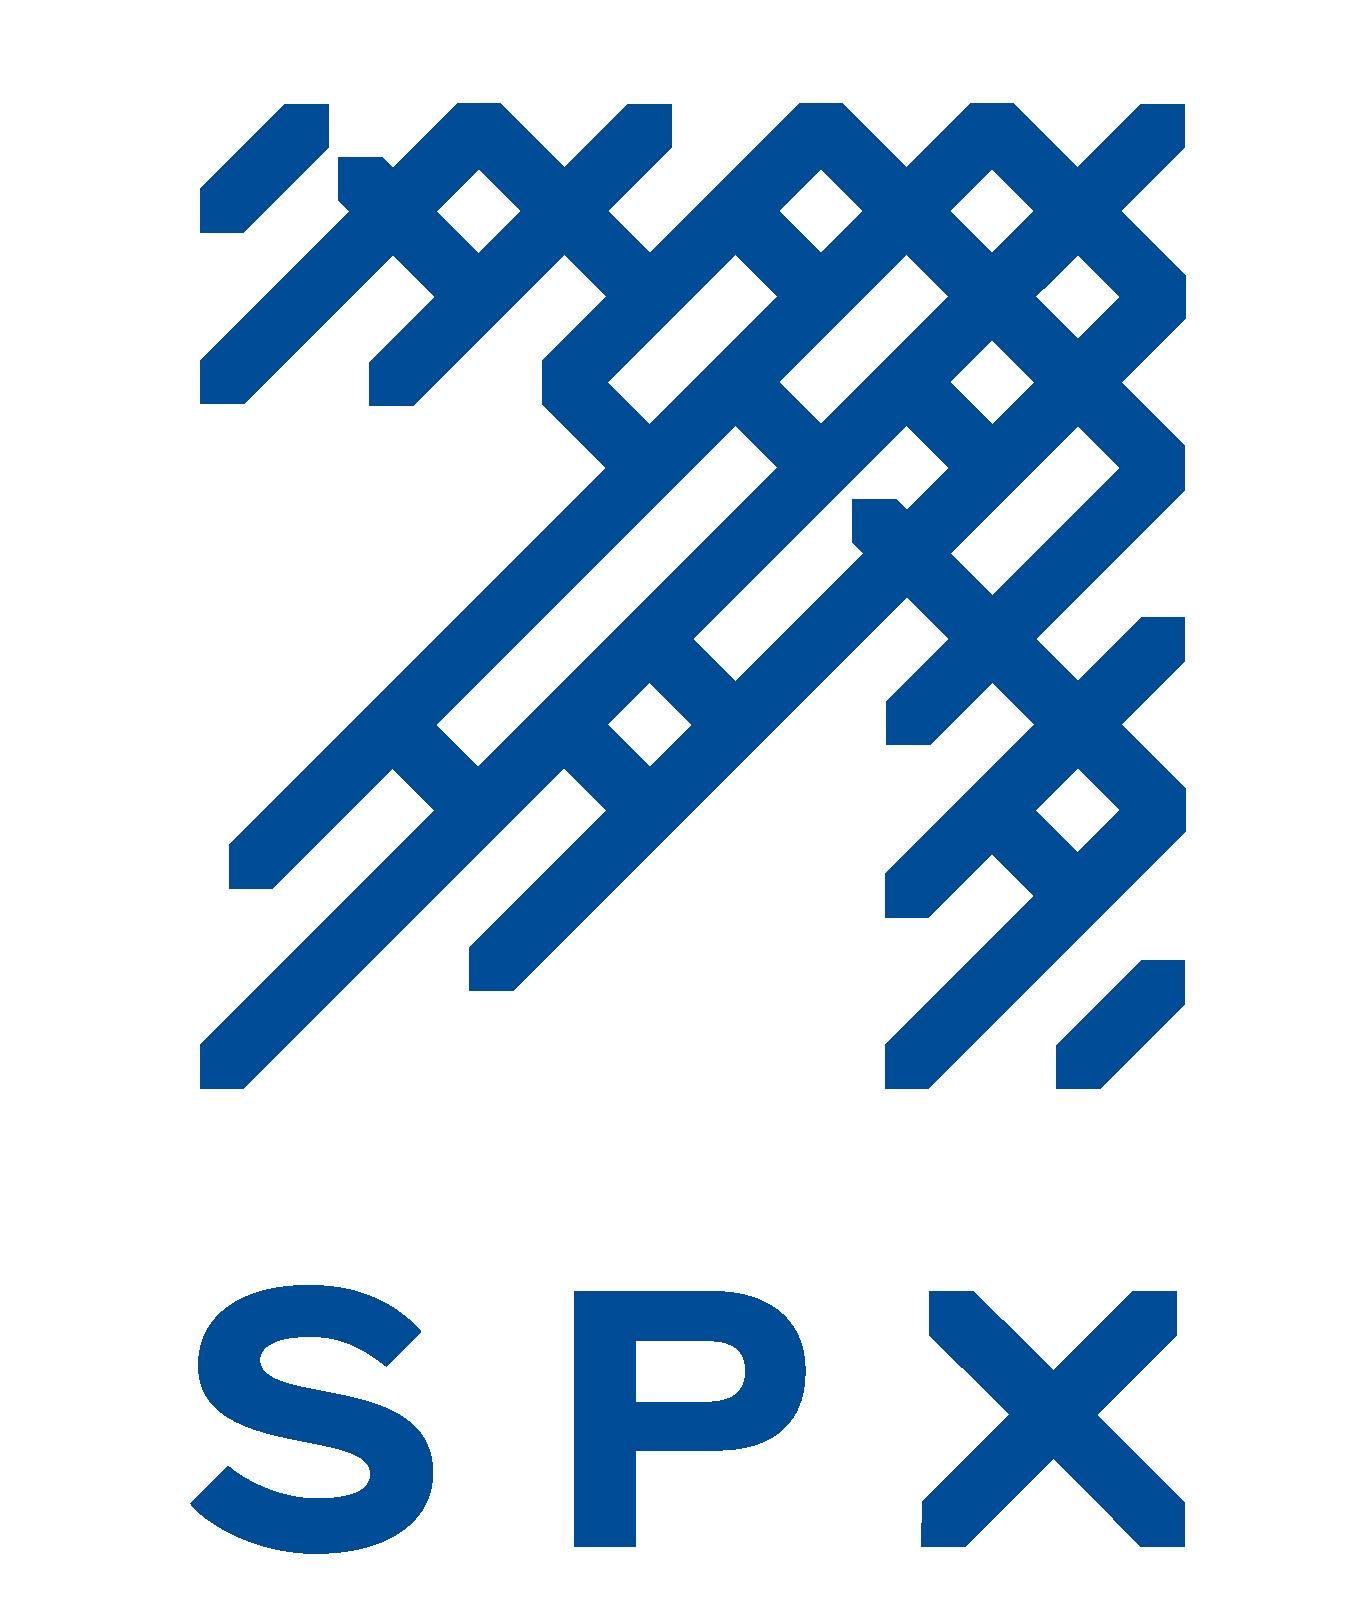 SPX_LOGO_VERT_RGB.png